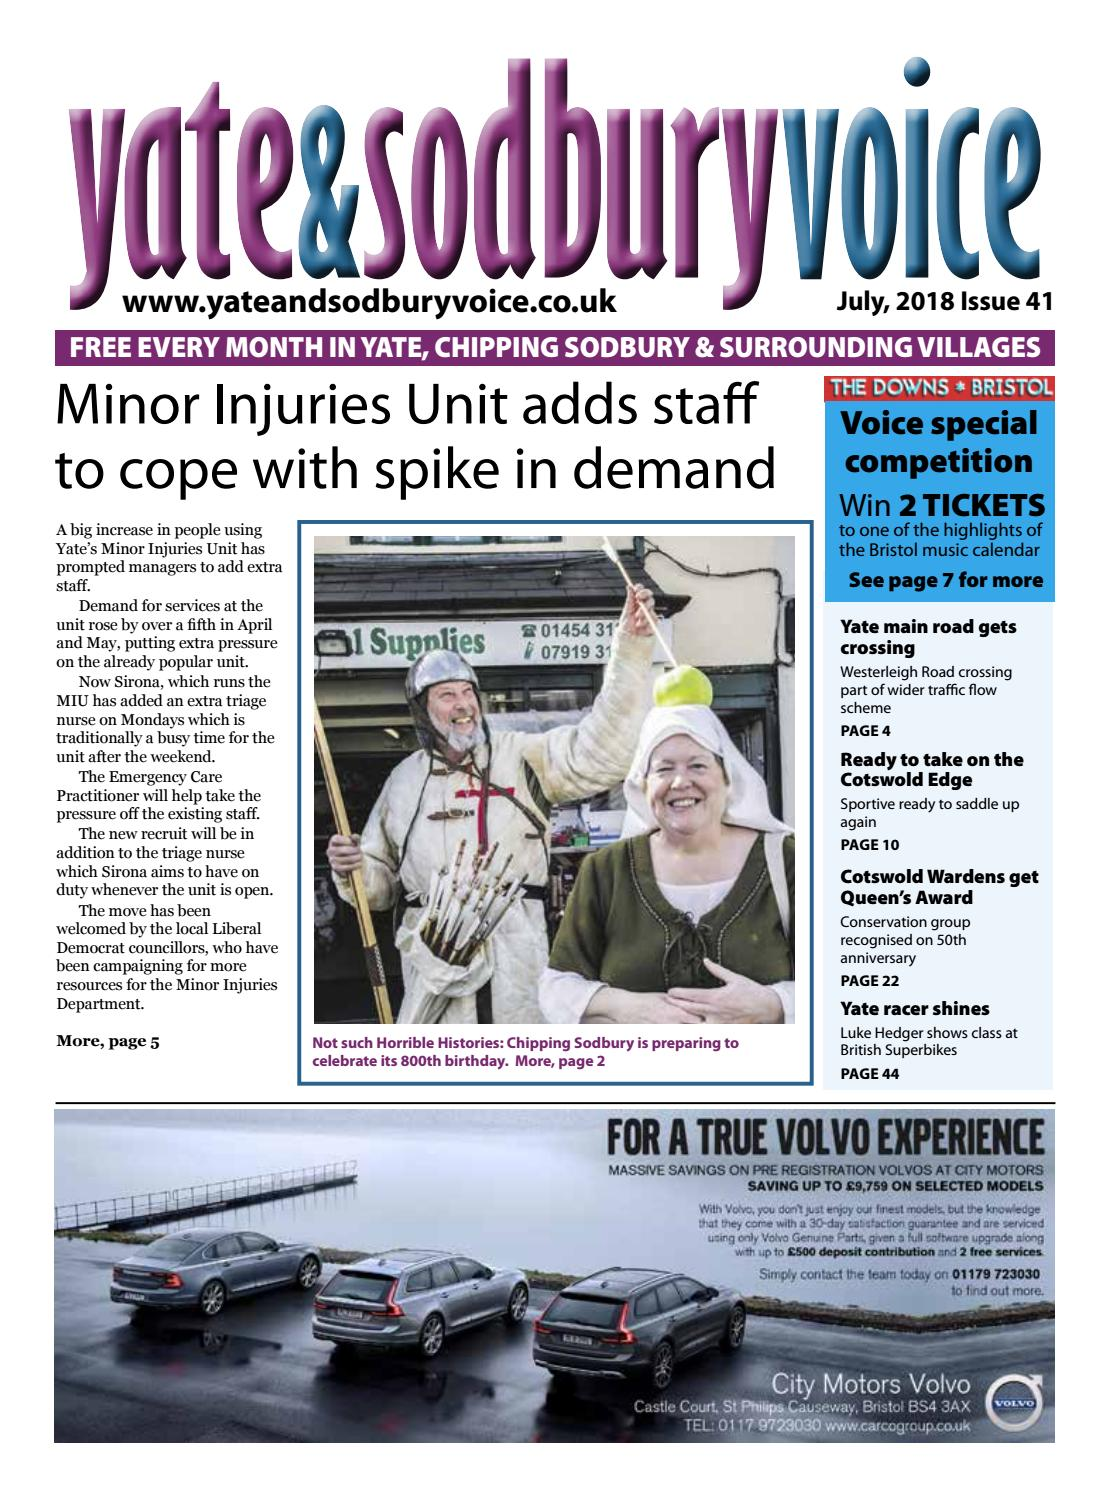 6c49deb382 Yate   Sodbury Voice July 2018 by Richard Drew at Yate and Sodbury ...